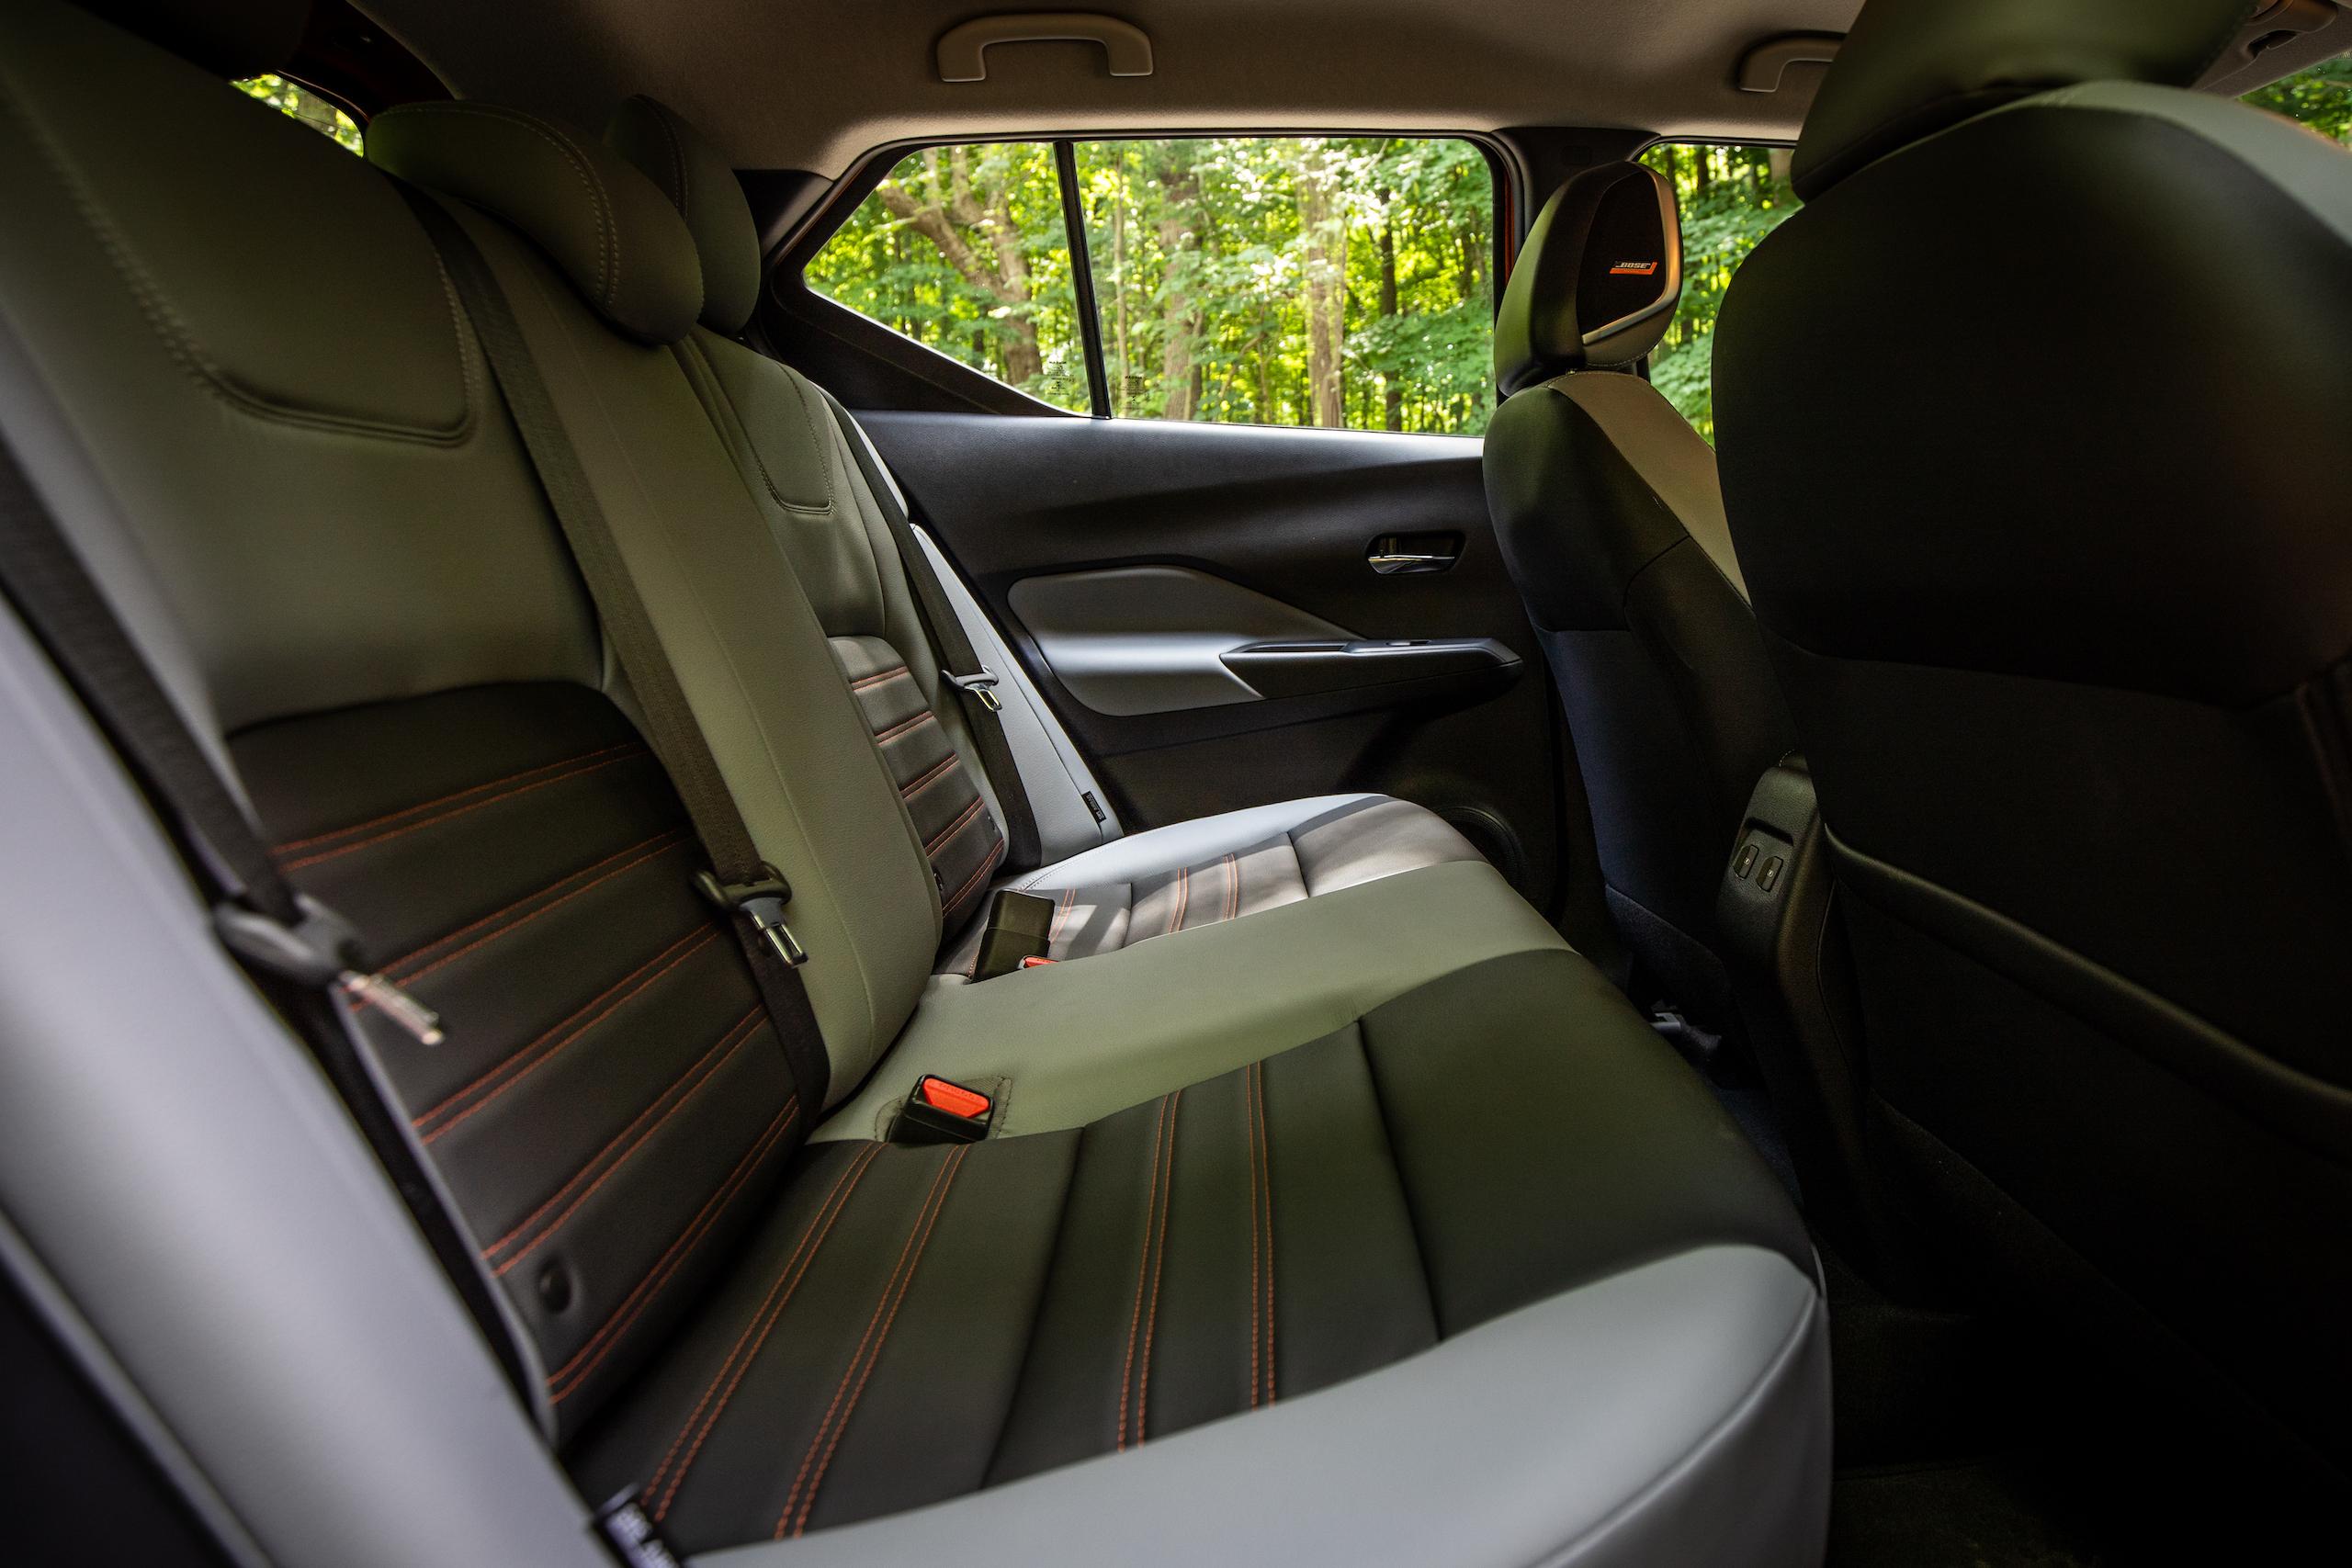 Nissan Kicks rear seat